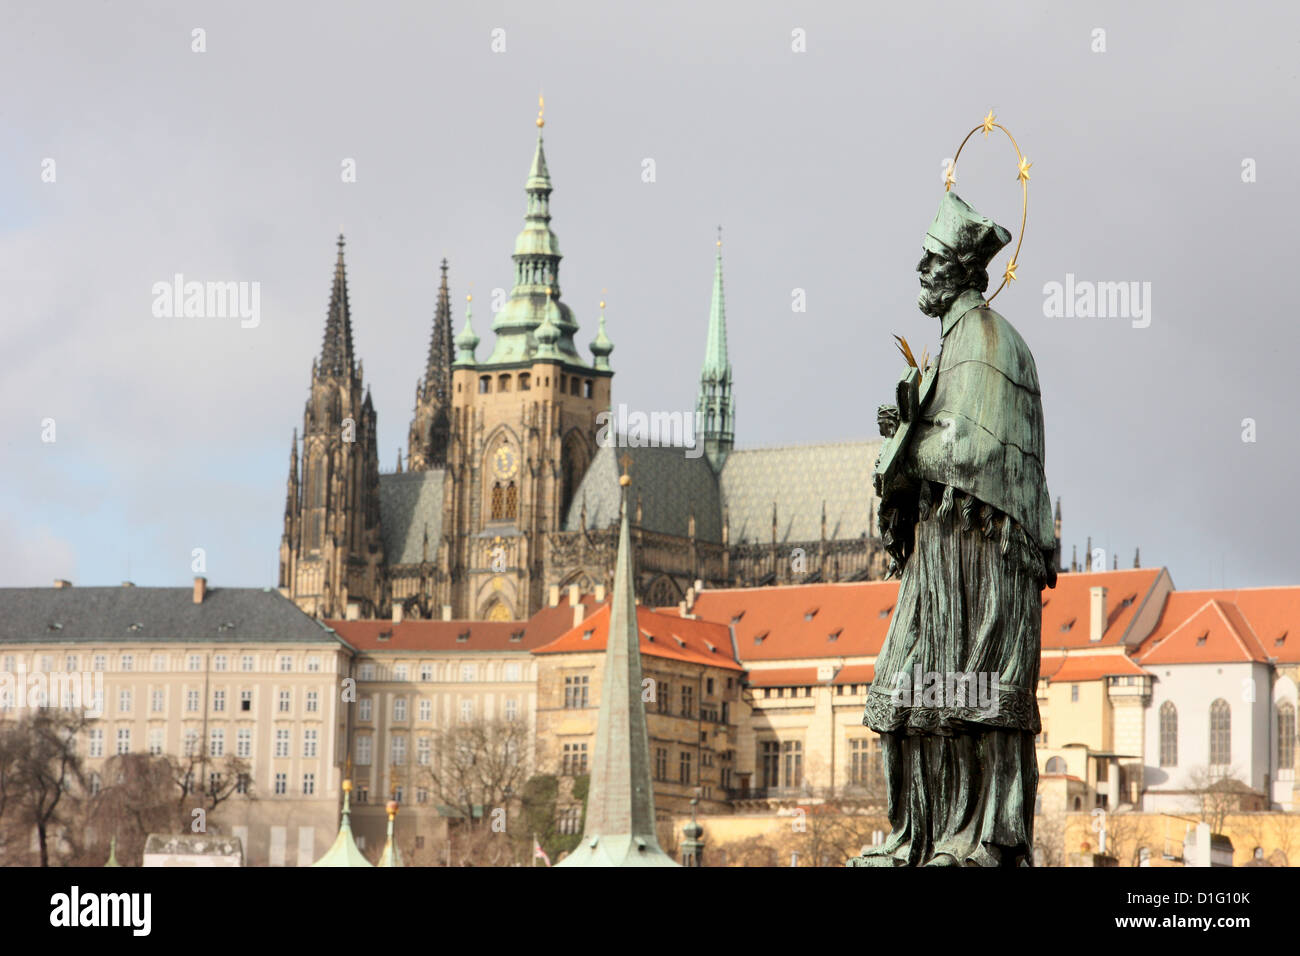 John of Nepomuk Statue on Charles bridge, UNESCO World Heritage Site, Prague, Czech Republic, Europe - Stock Image